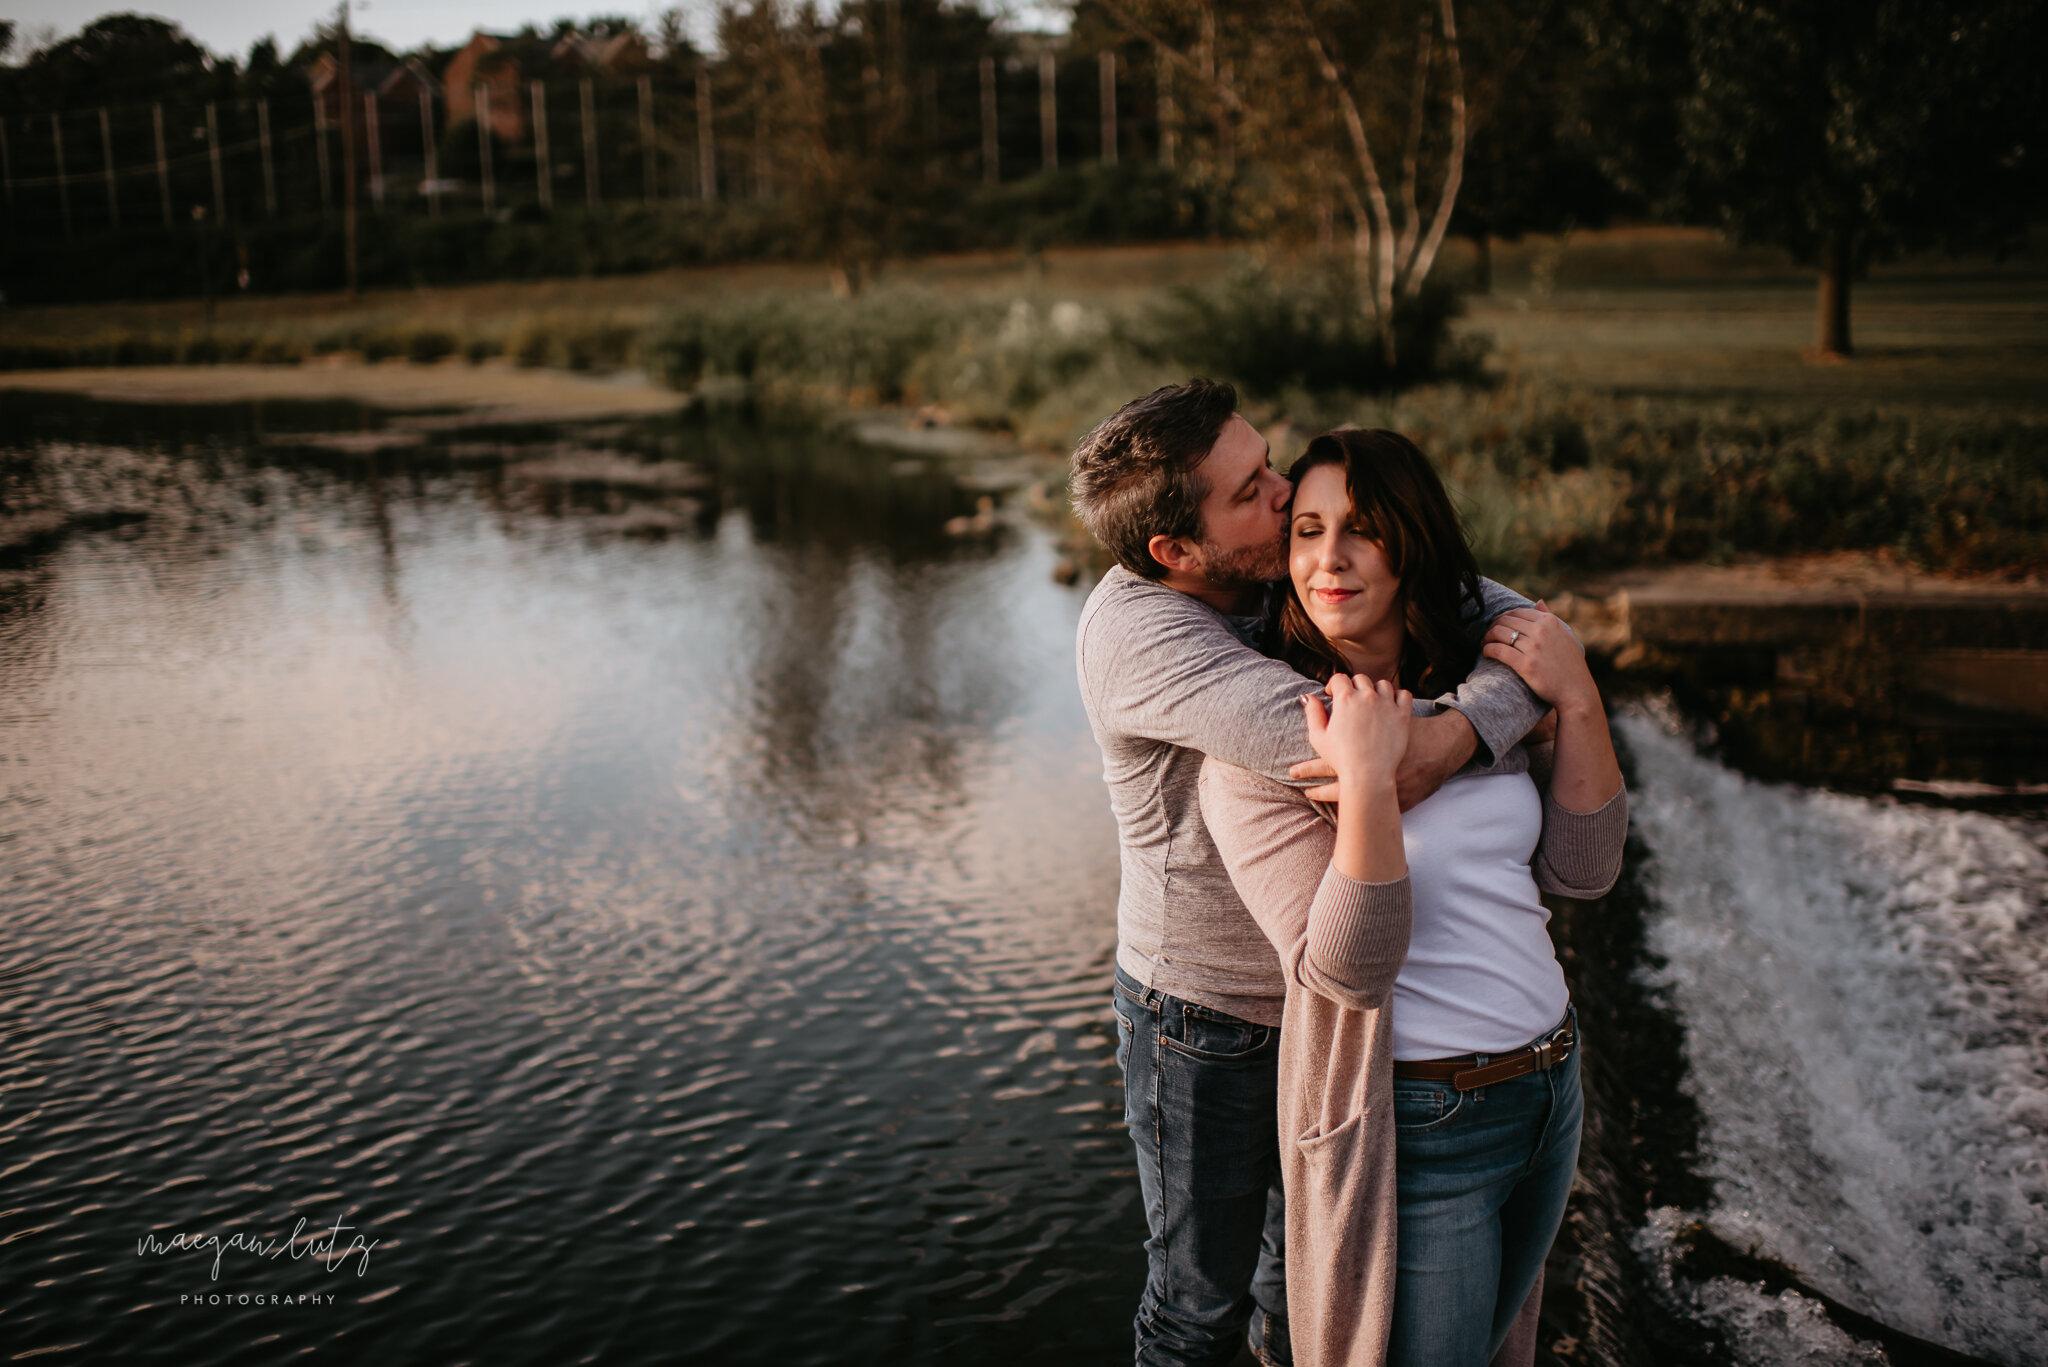 NEPA-Lehigh-Valley-Wedding-Engagement-photographer-at-the-rose-garden-allentown-PA-6.jpg